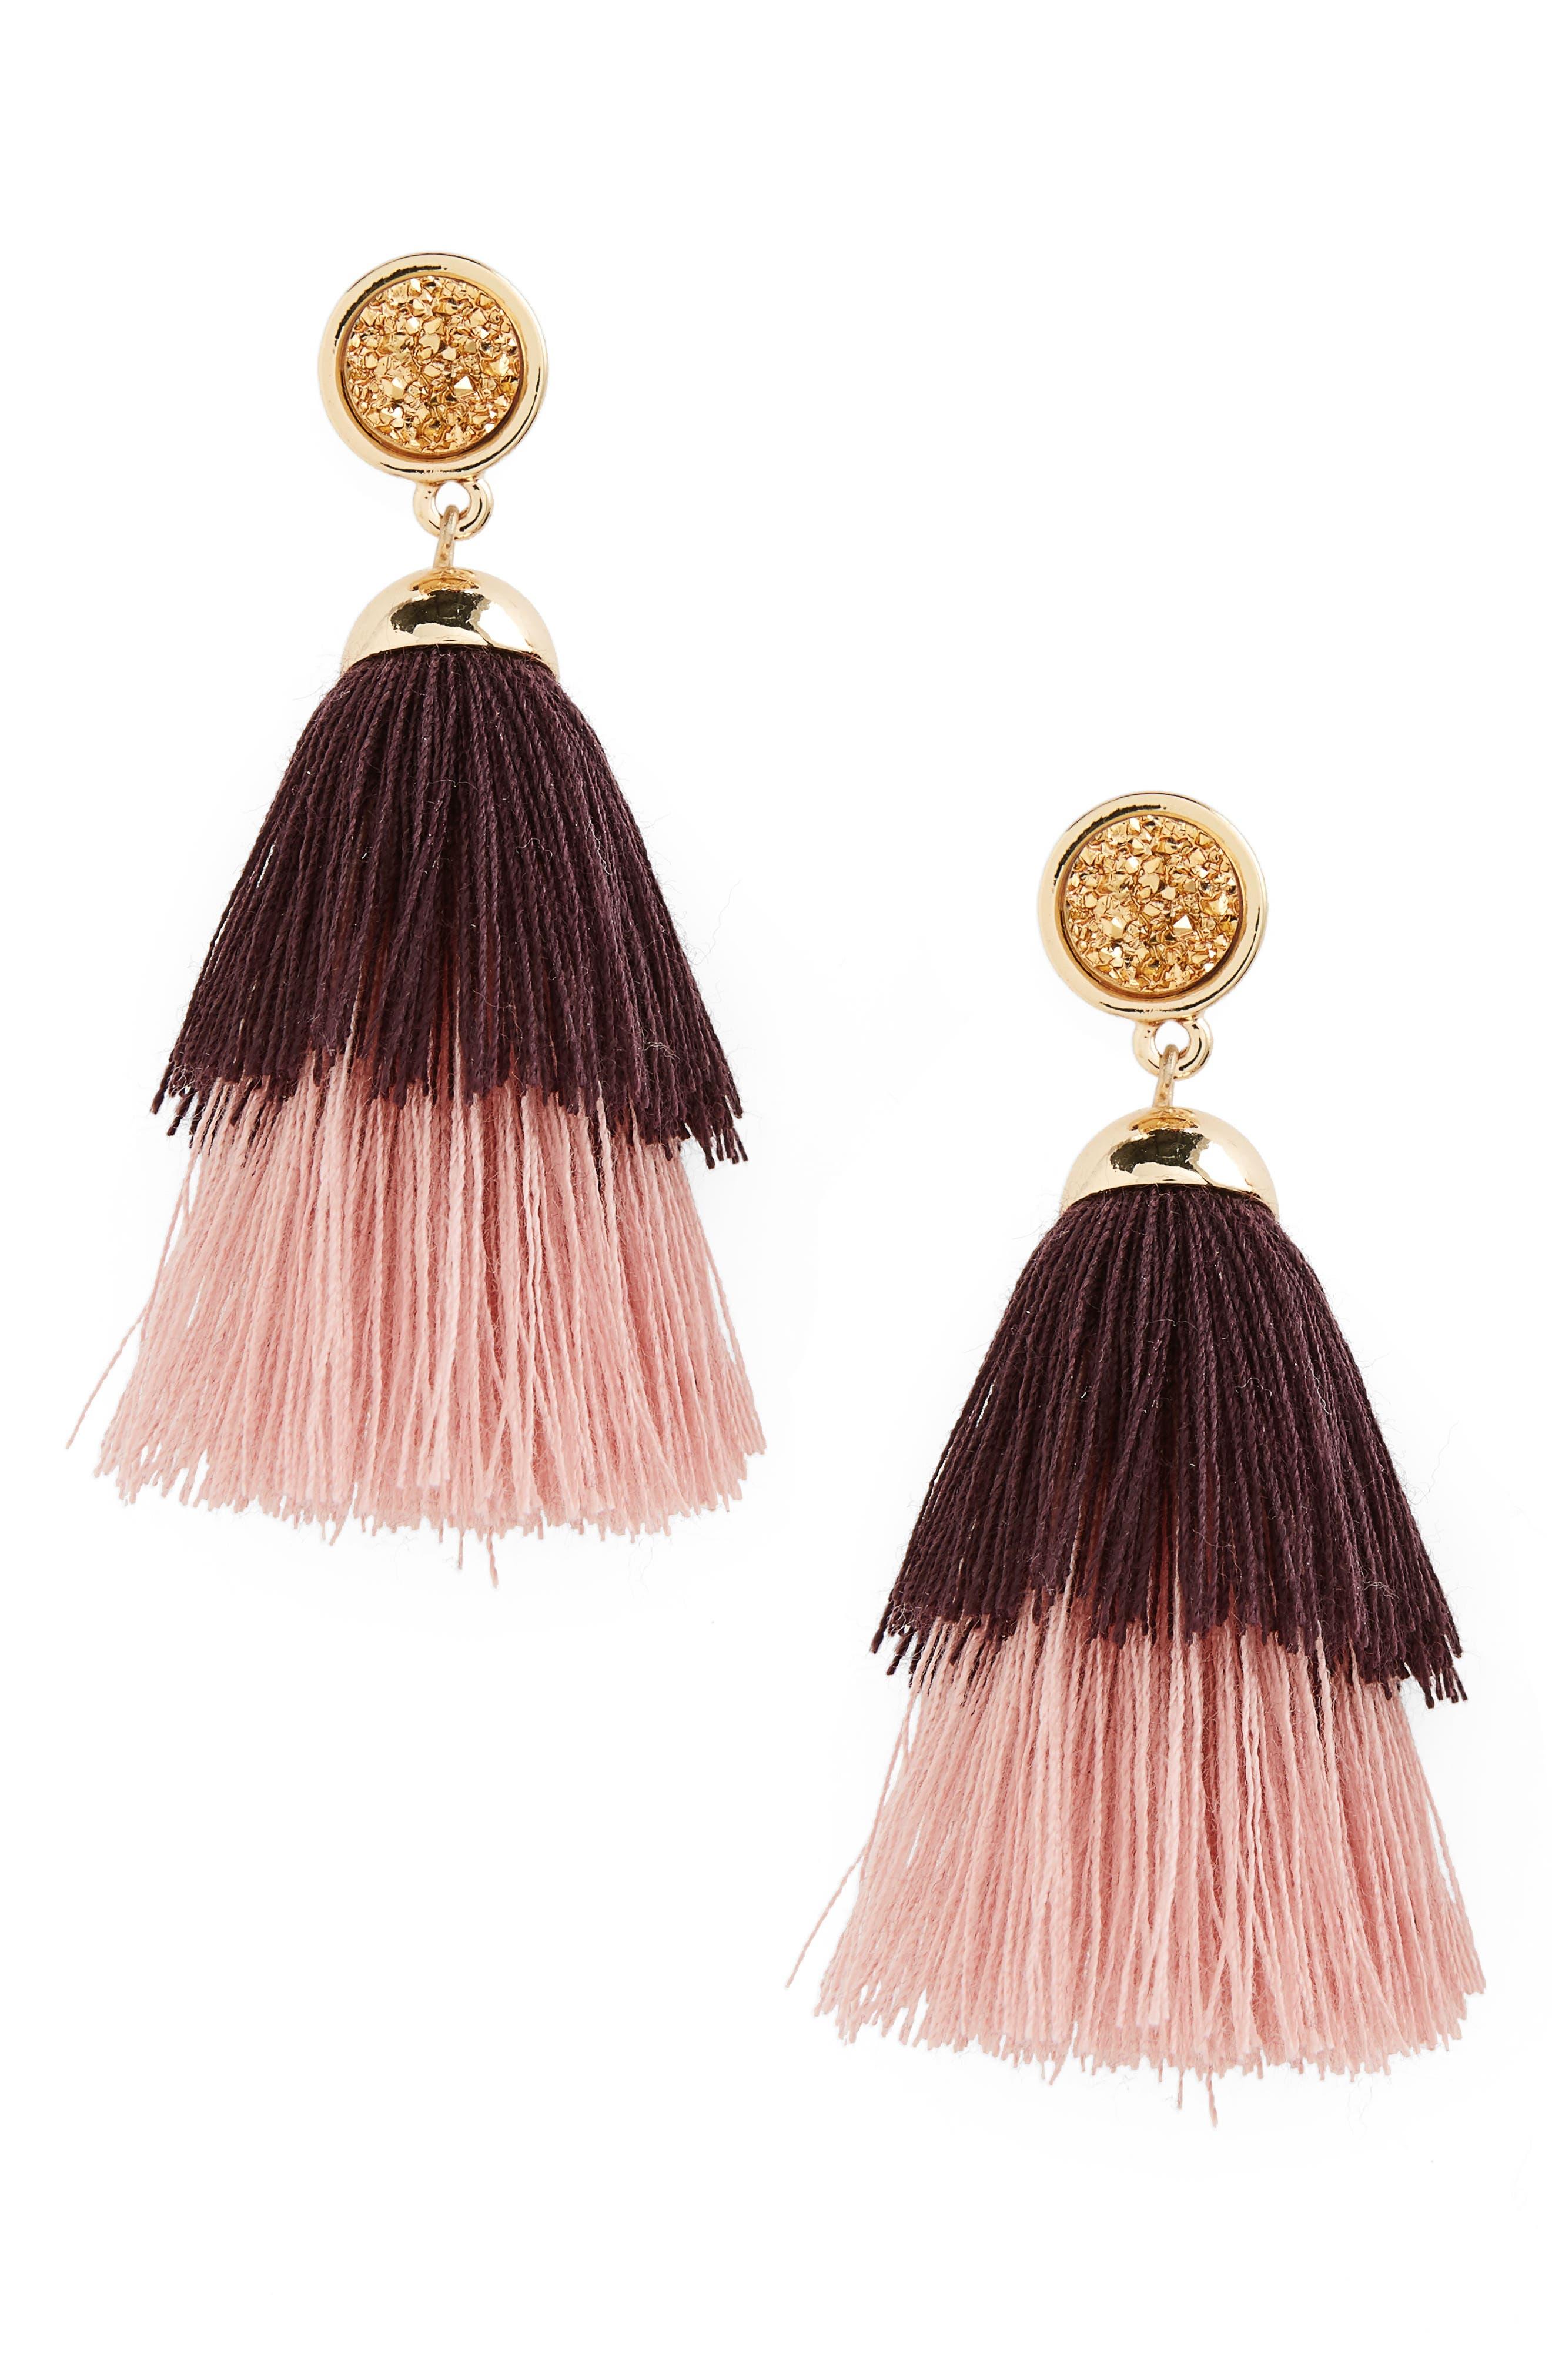 Faux Drusy Tassel Drop Earrings,                             Main thumbnail 1, color,                             500